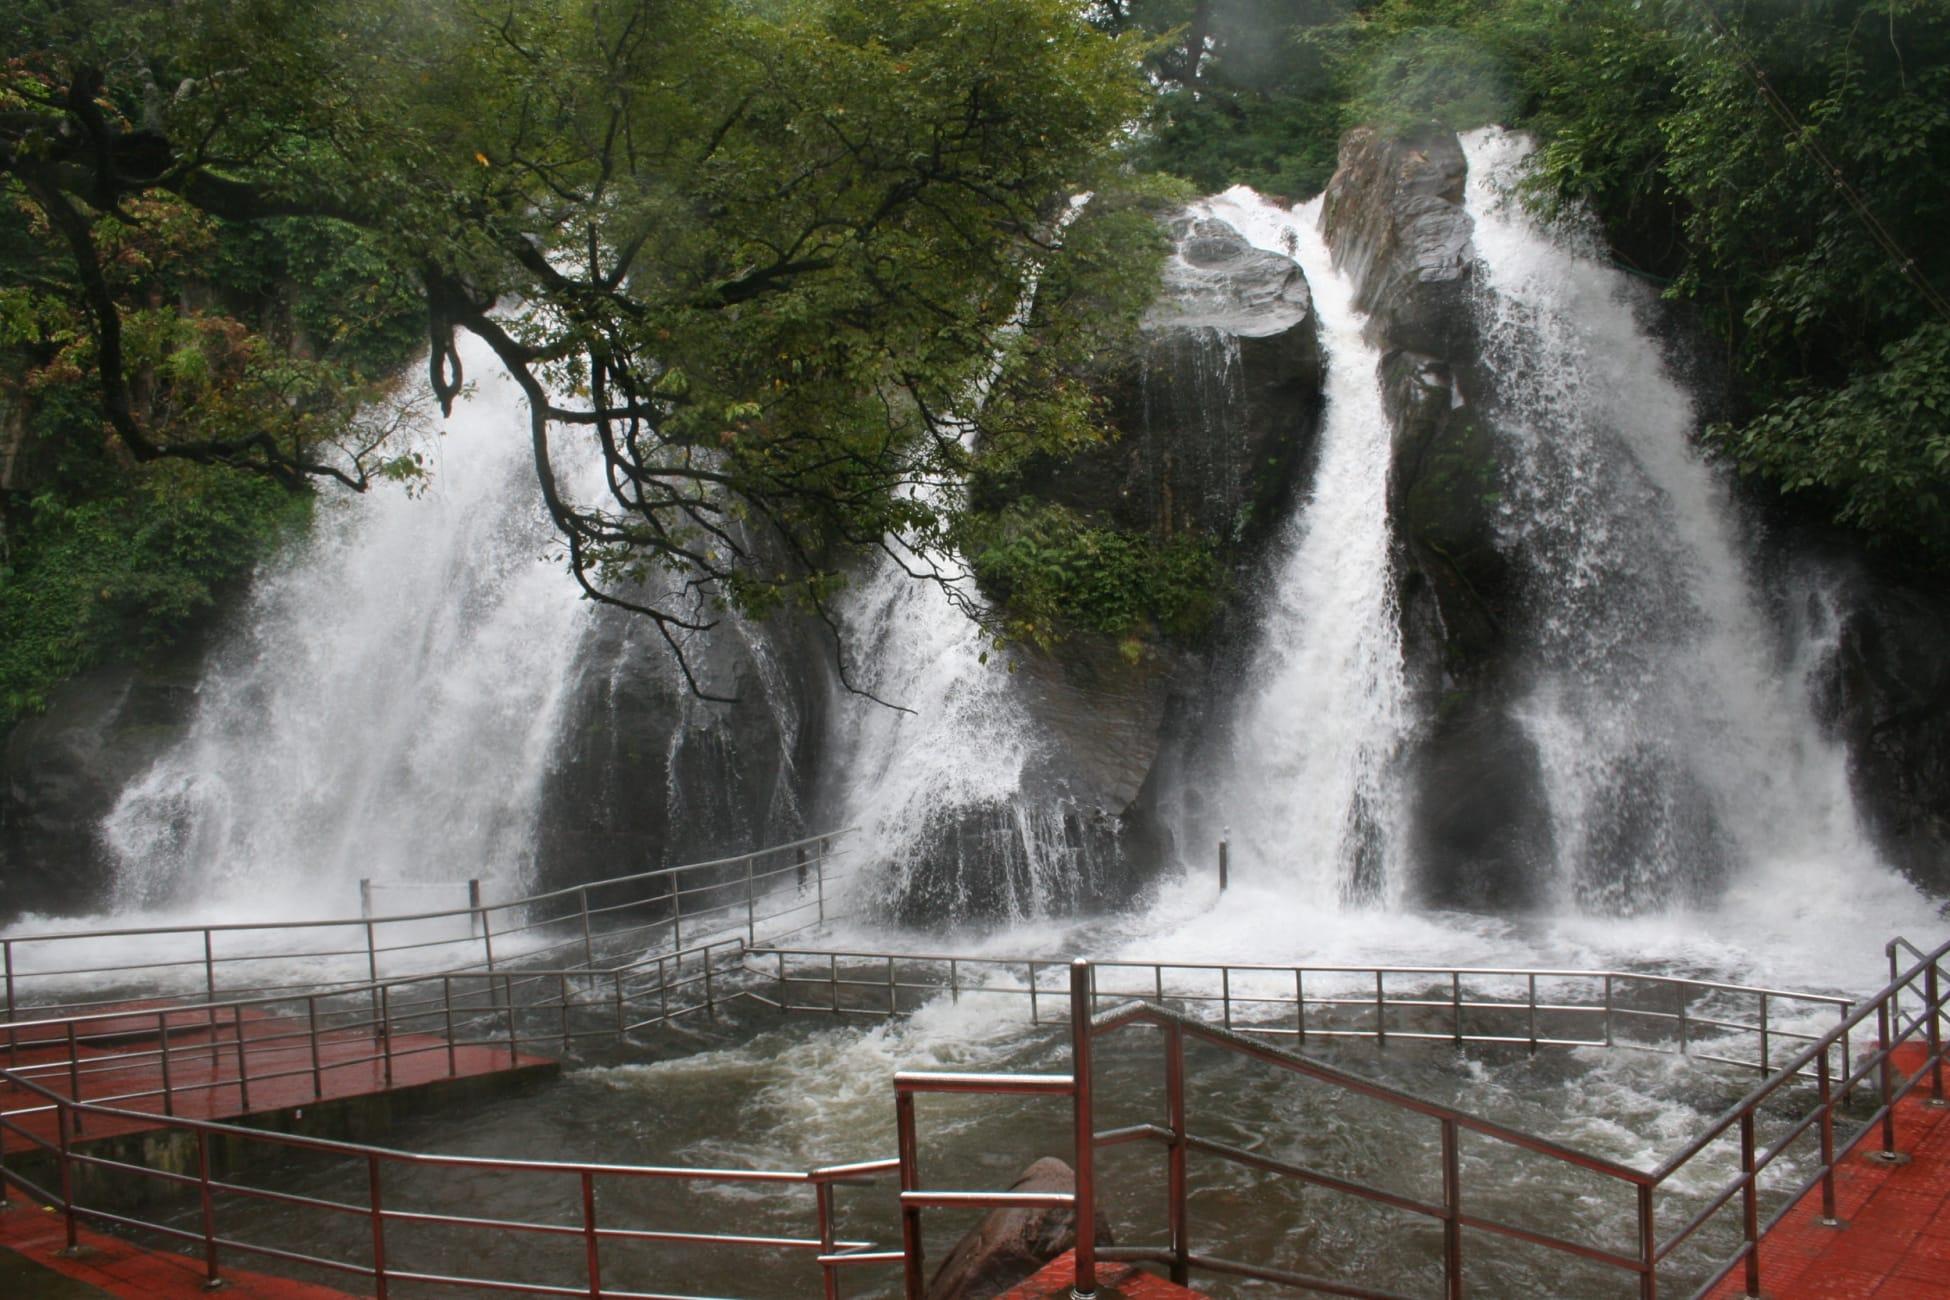 Famous tourist places in tamilnadu | தமிழ்நாட்டில் பிரபலமான சுற்றுலா இடங்கள் |_160.1